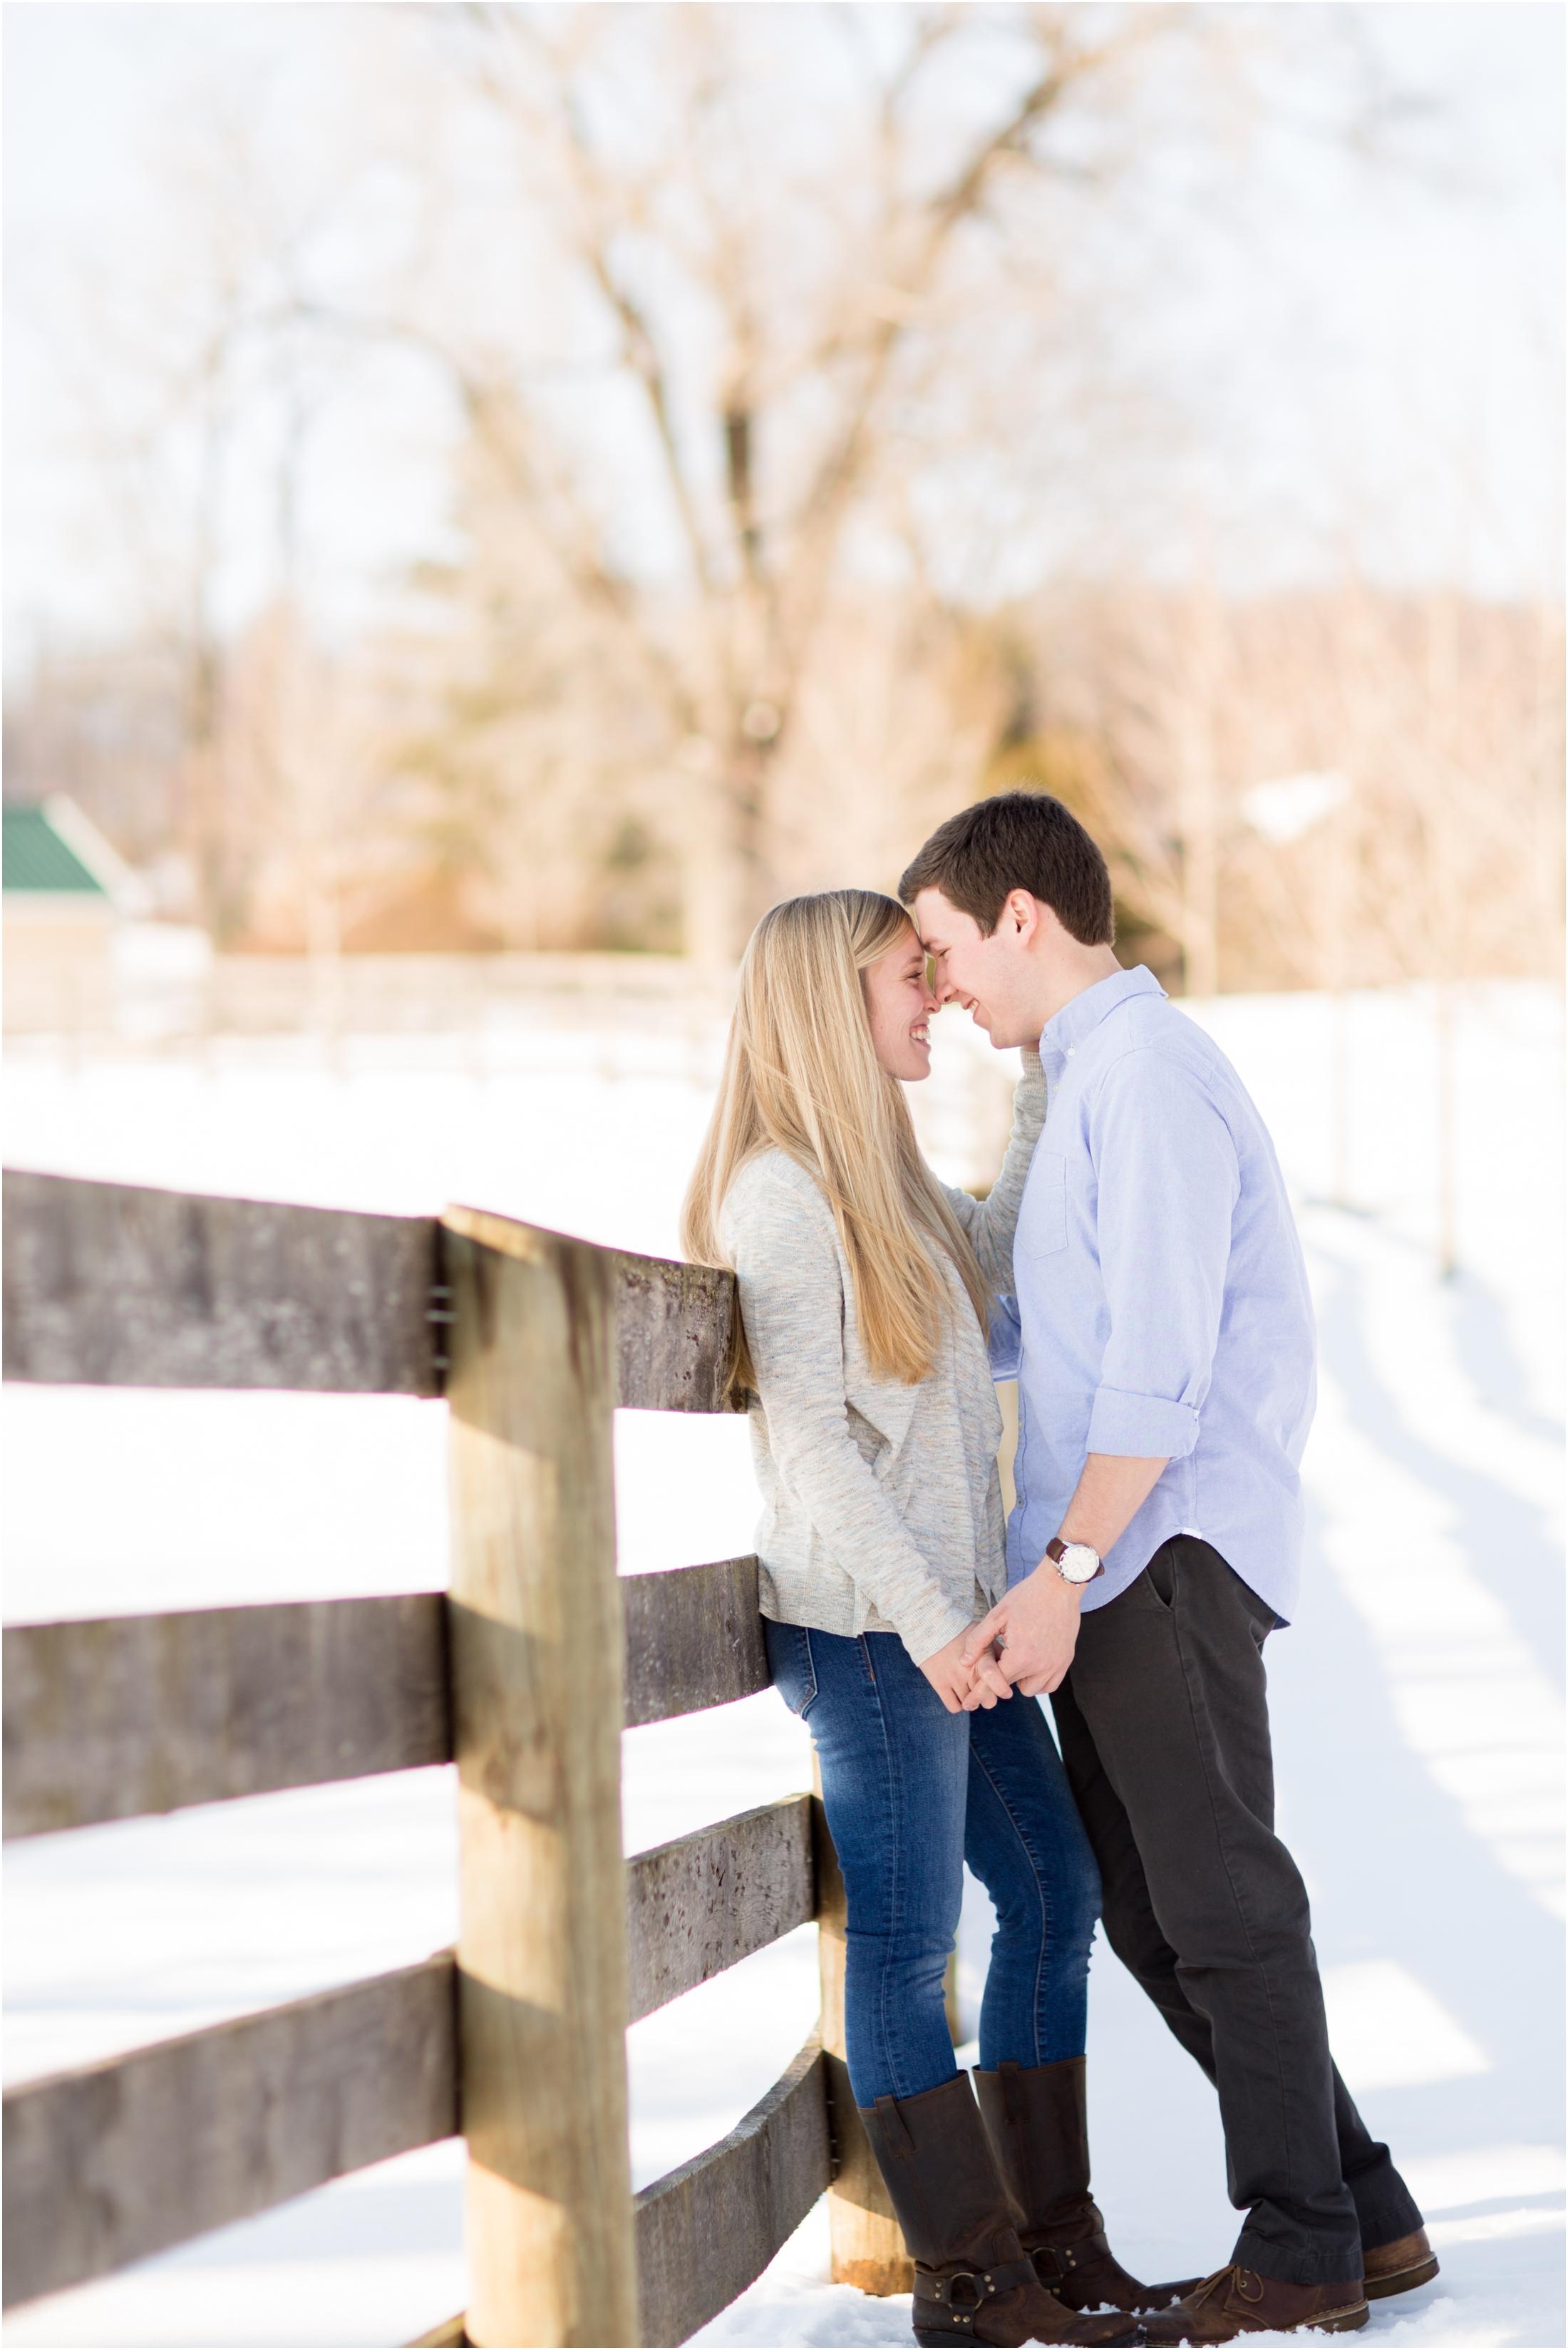 Emily-Caleb-Engaged-11.jpg